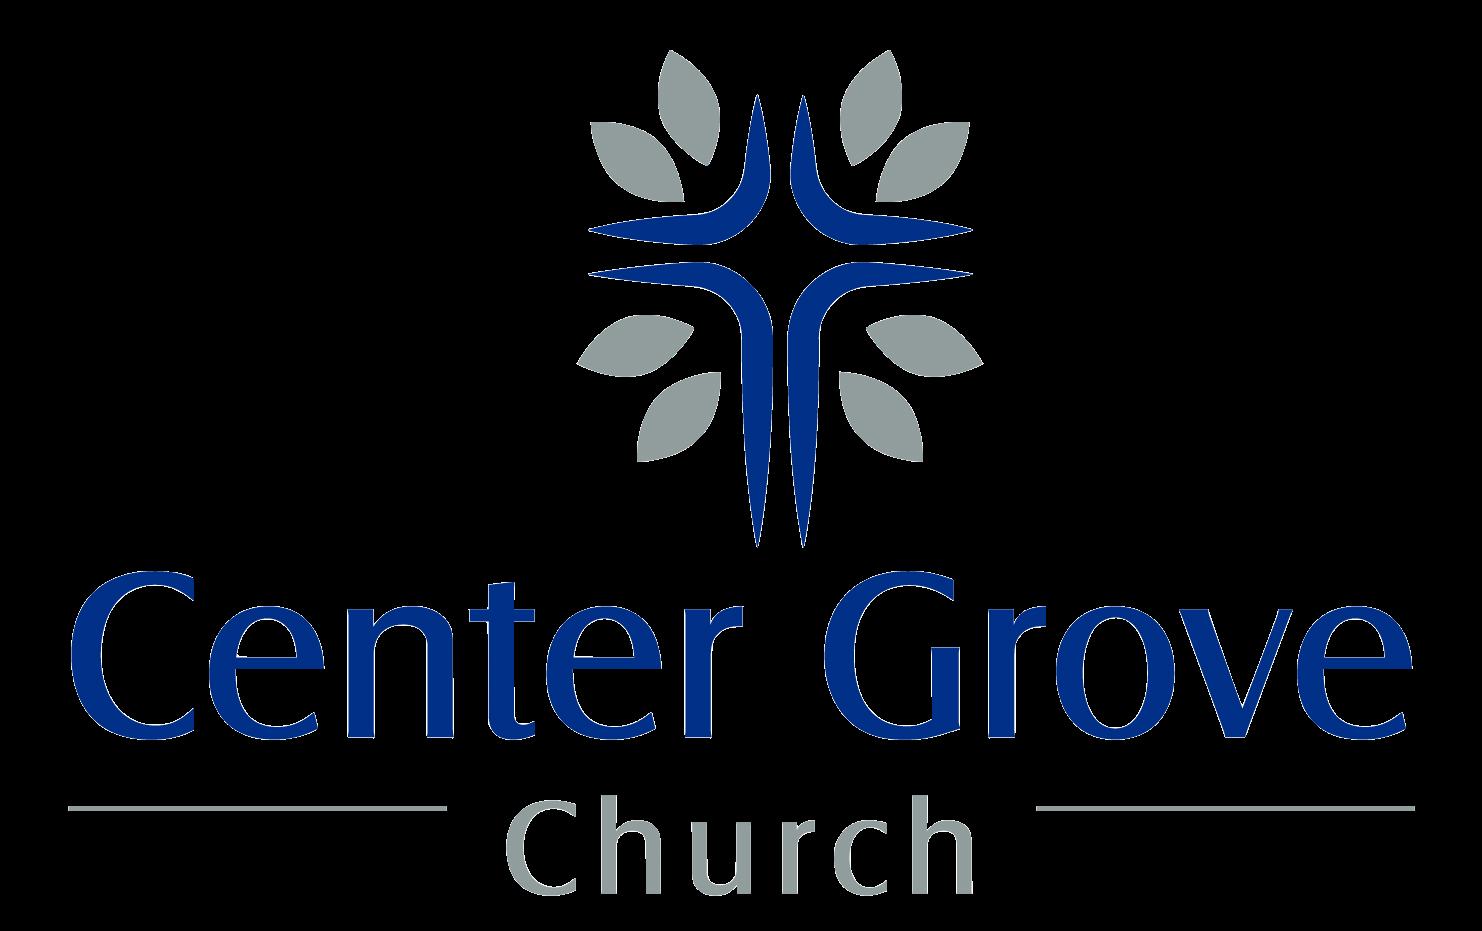 Center Grove Church logo JPG.png